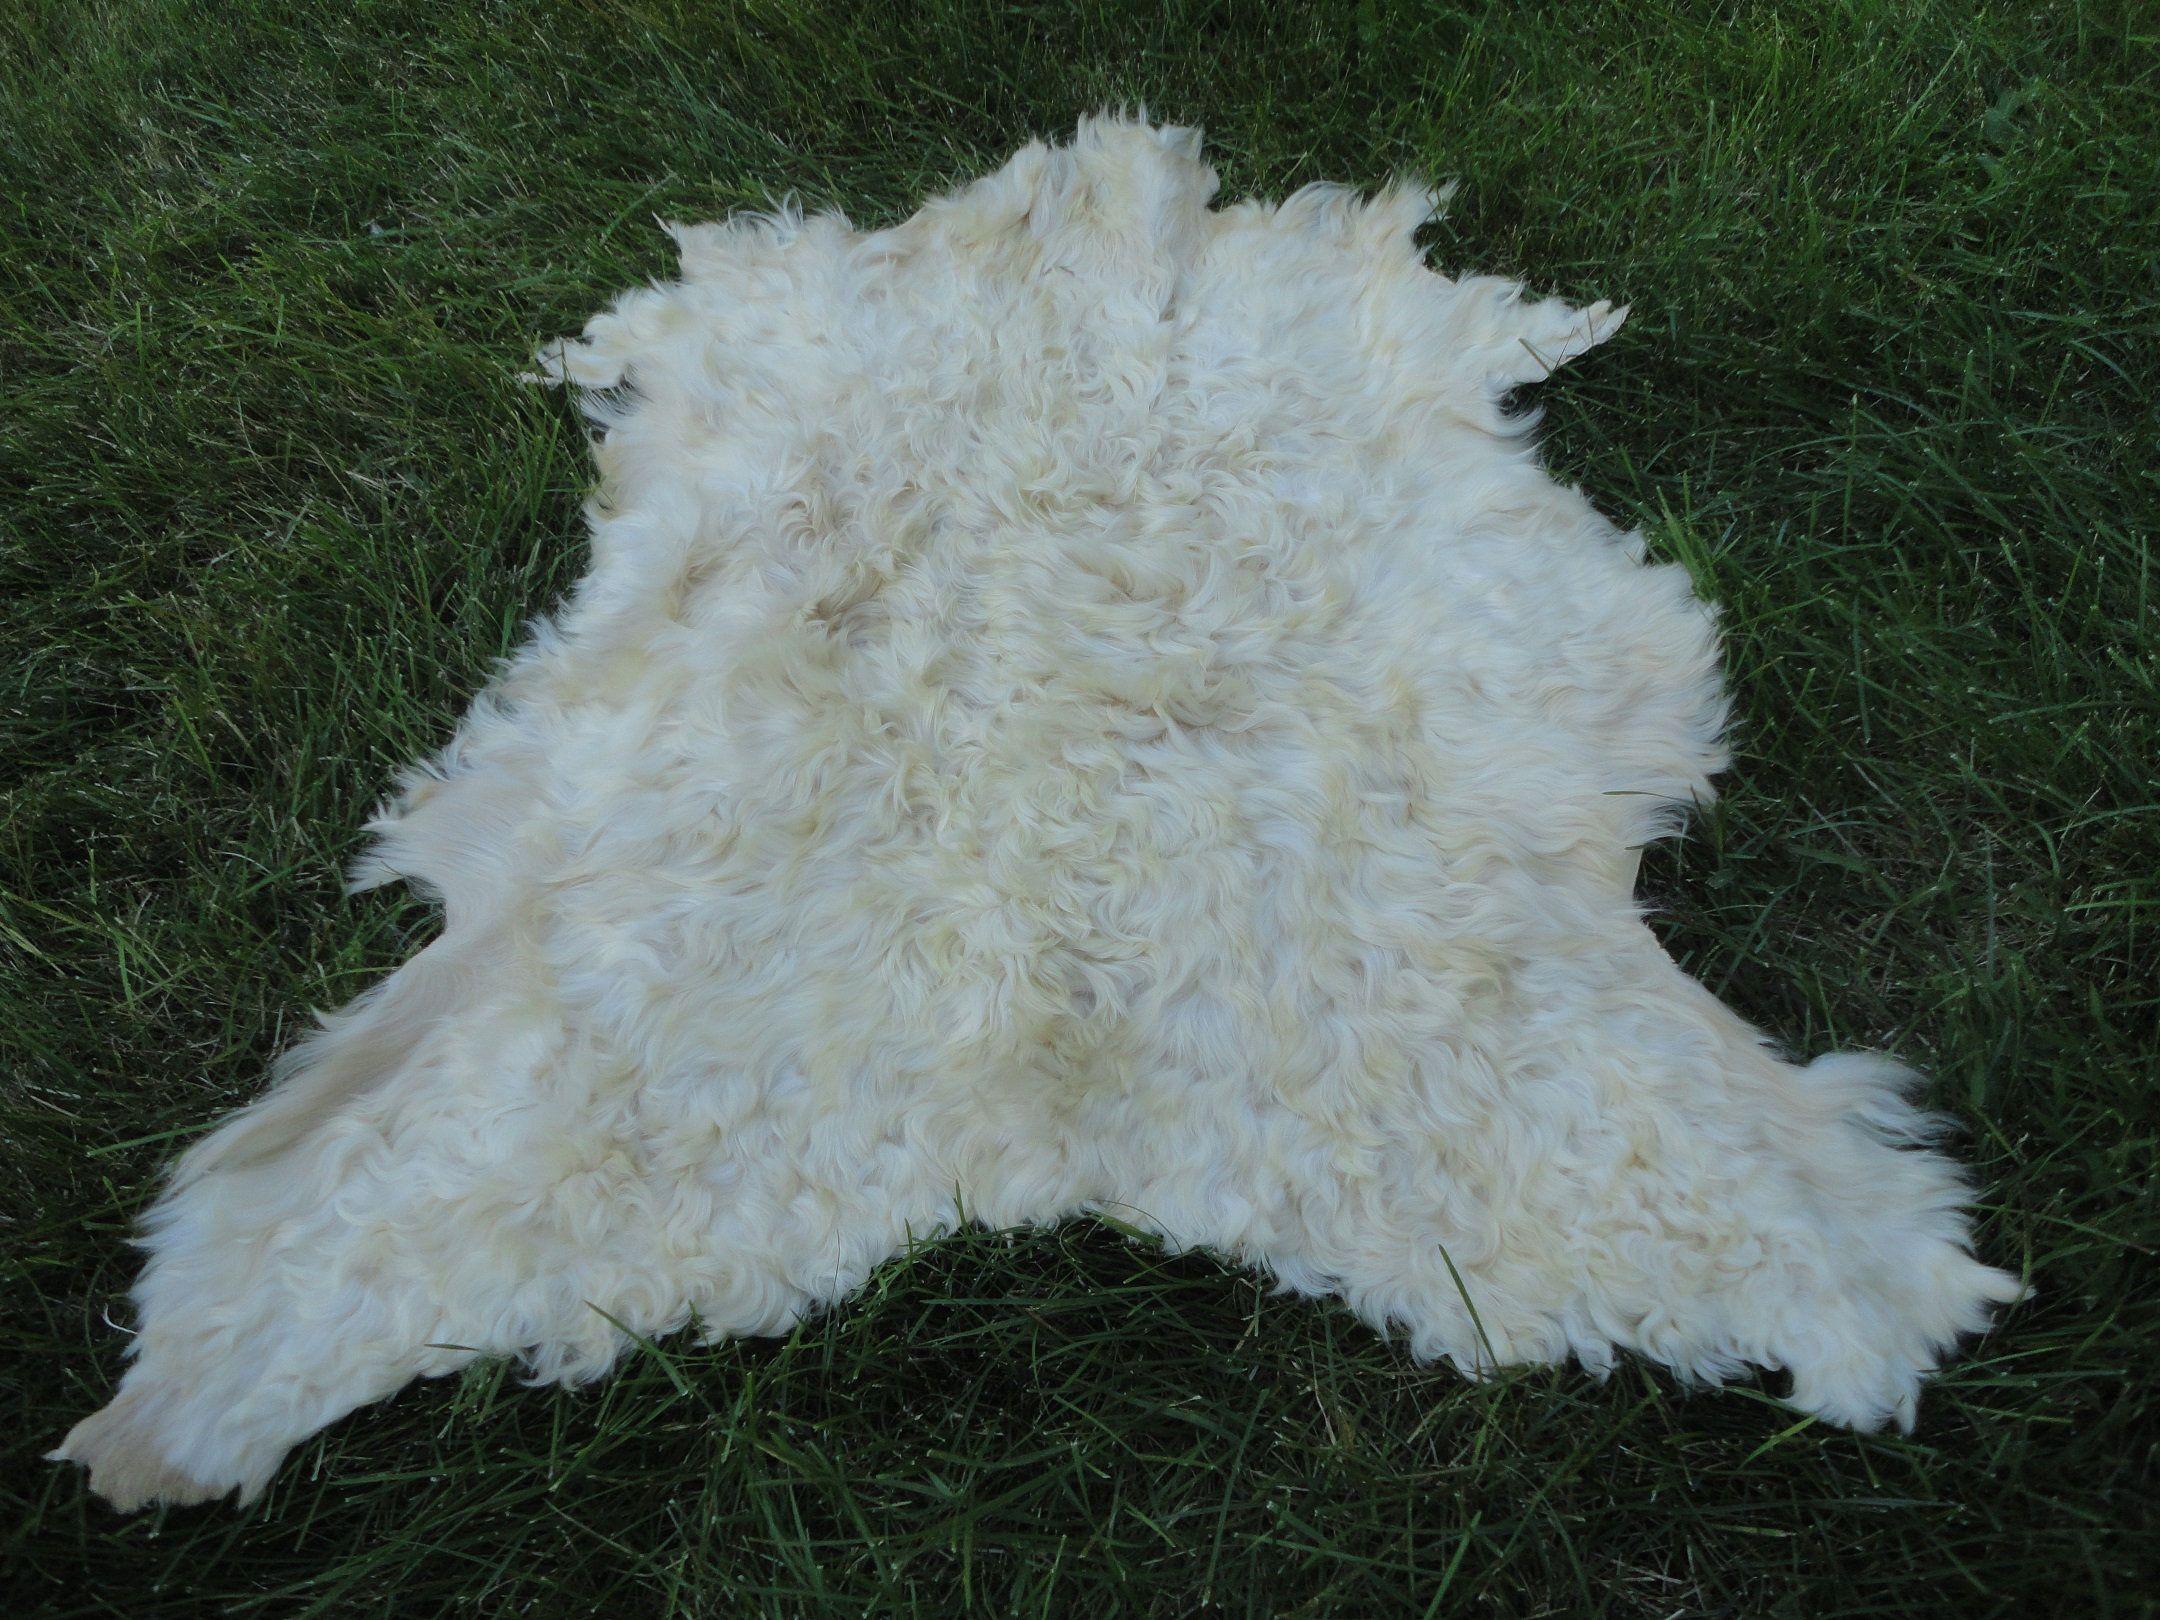 best gift goatskin pelt fur natural leather carpet turkish perfectly tanned skin 3 3 x 2 6 ft bedridden decorativ hayvan derisi hali evcil hayvanlar hali